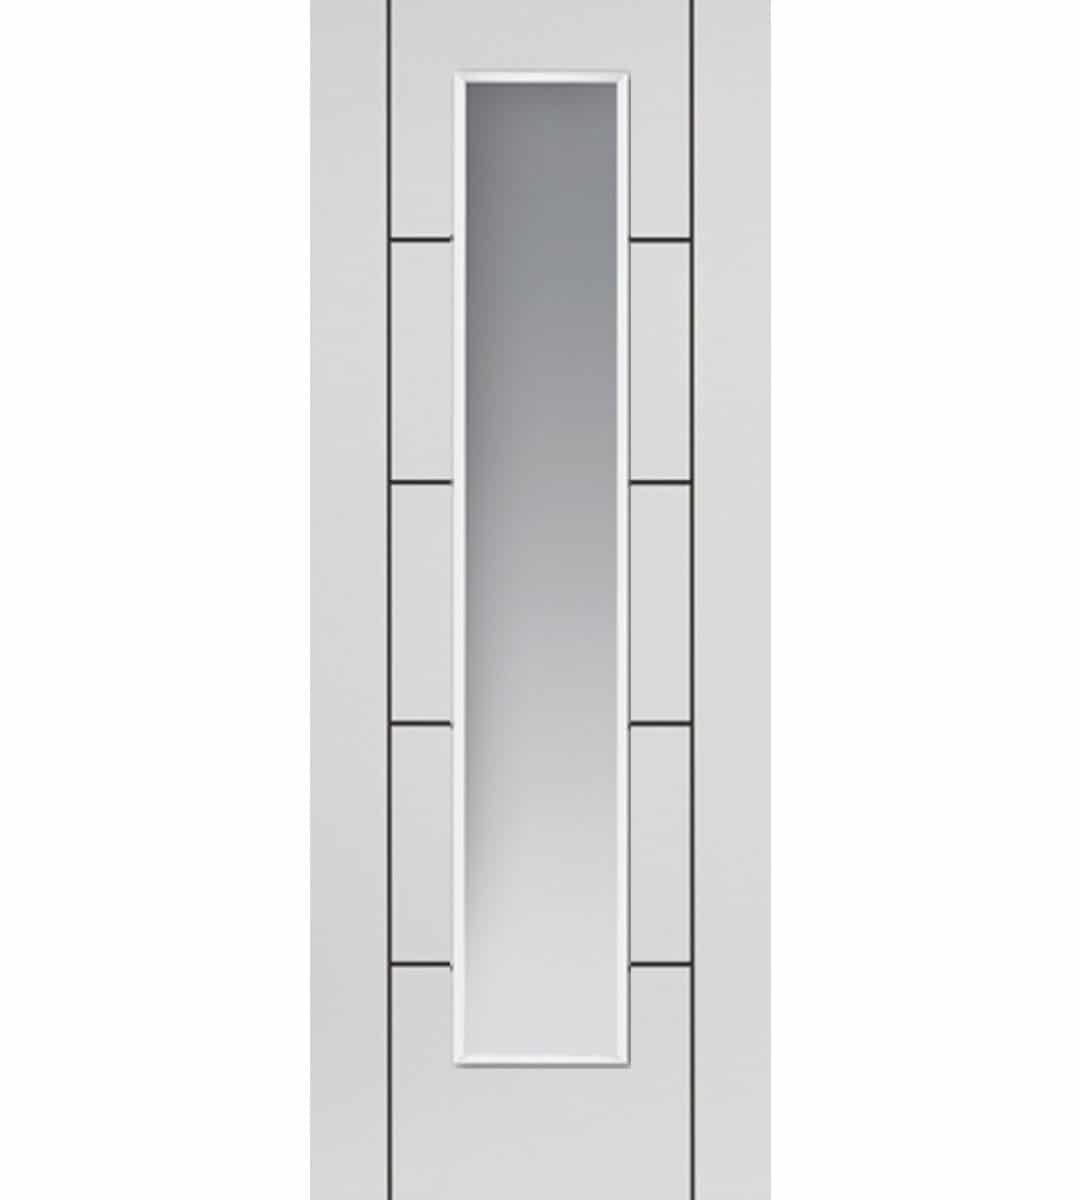 eco linea white glazed internal door